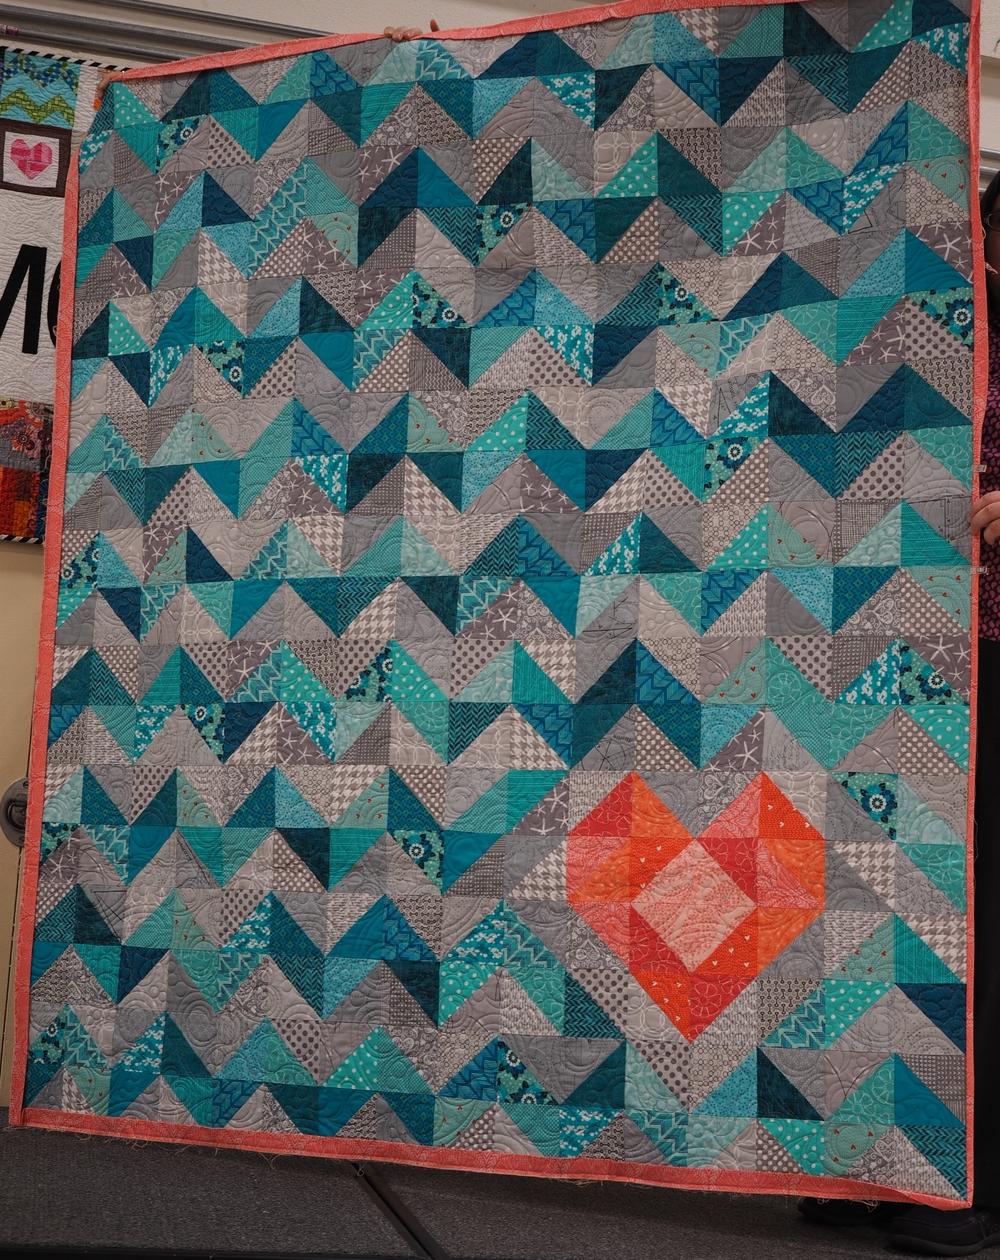 Heather Perez  I heart chevron pattern love - Mari Jorgen  Quilted by Susan Bouturll in Dallas, TX